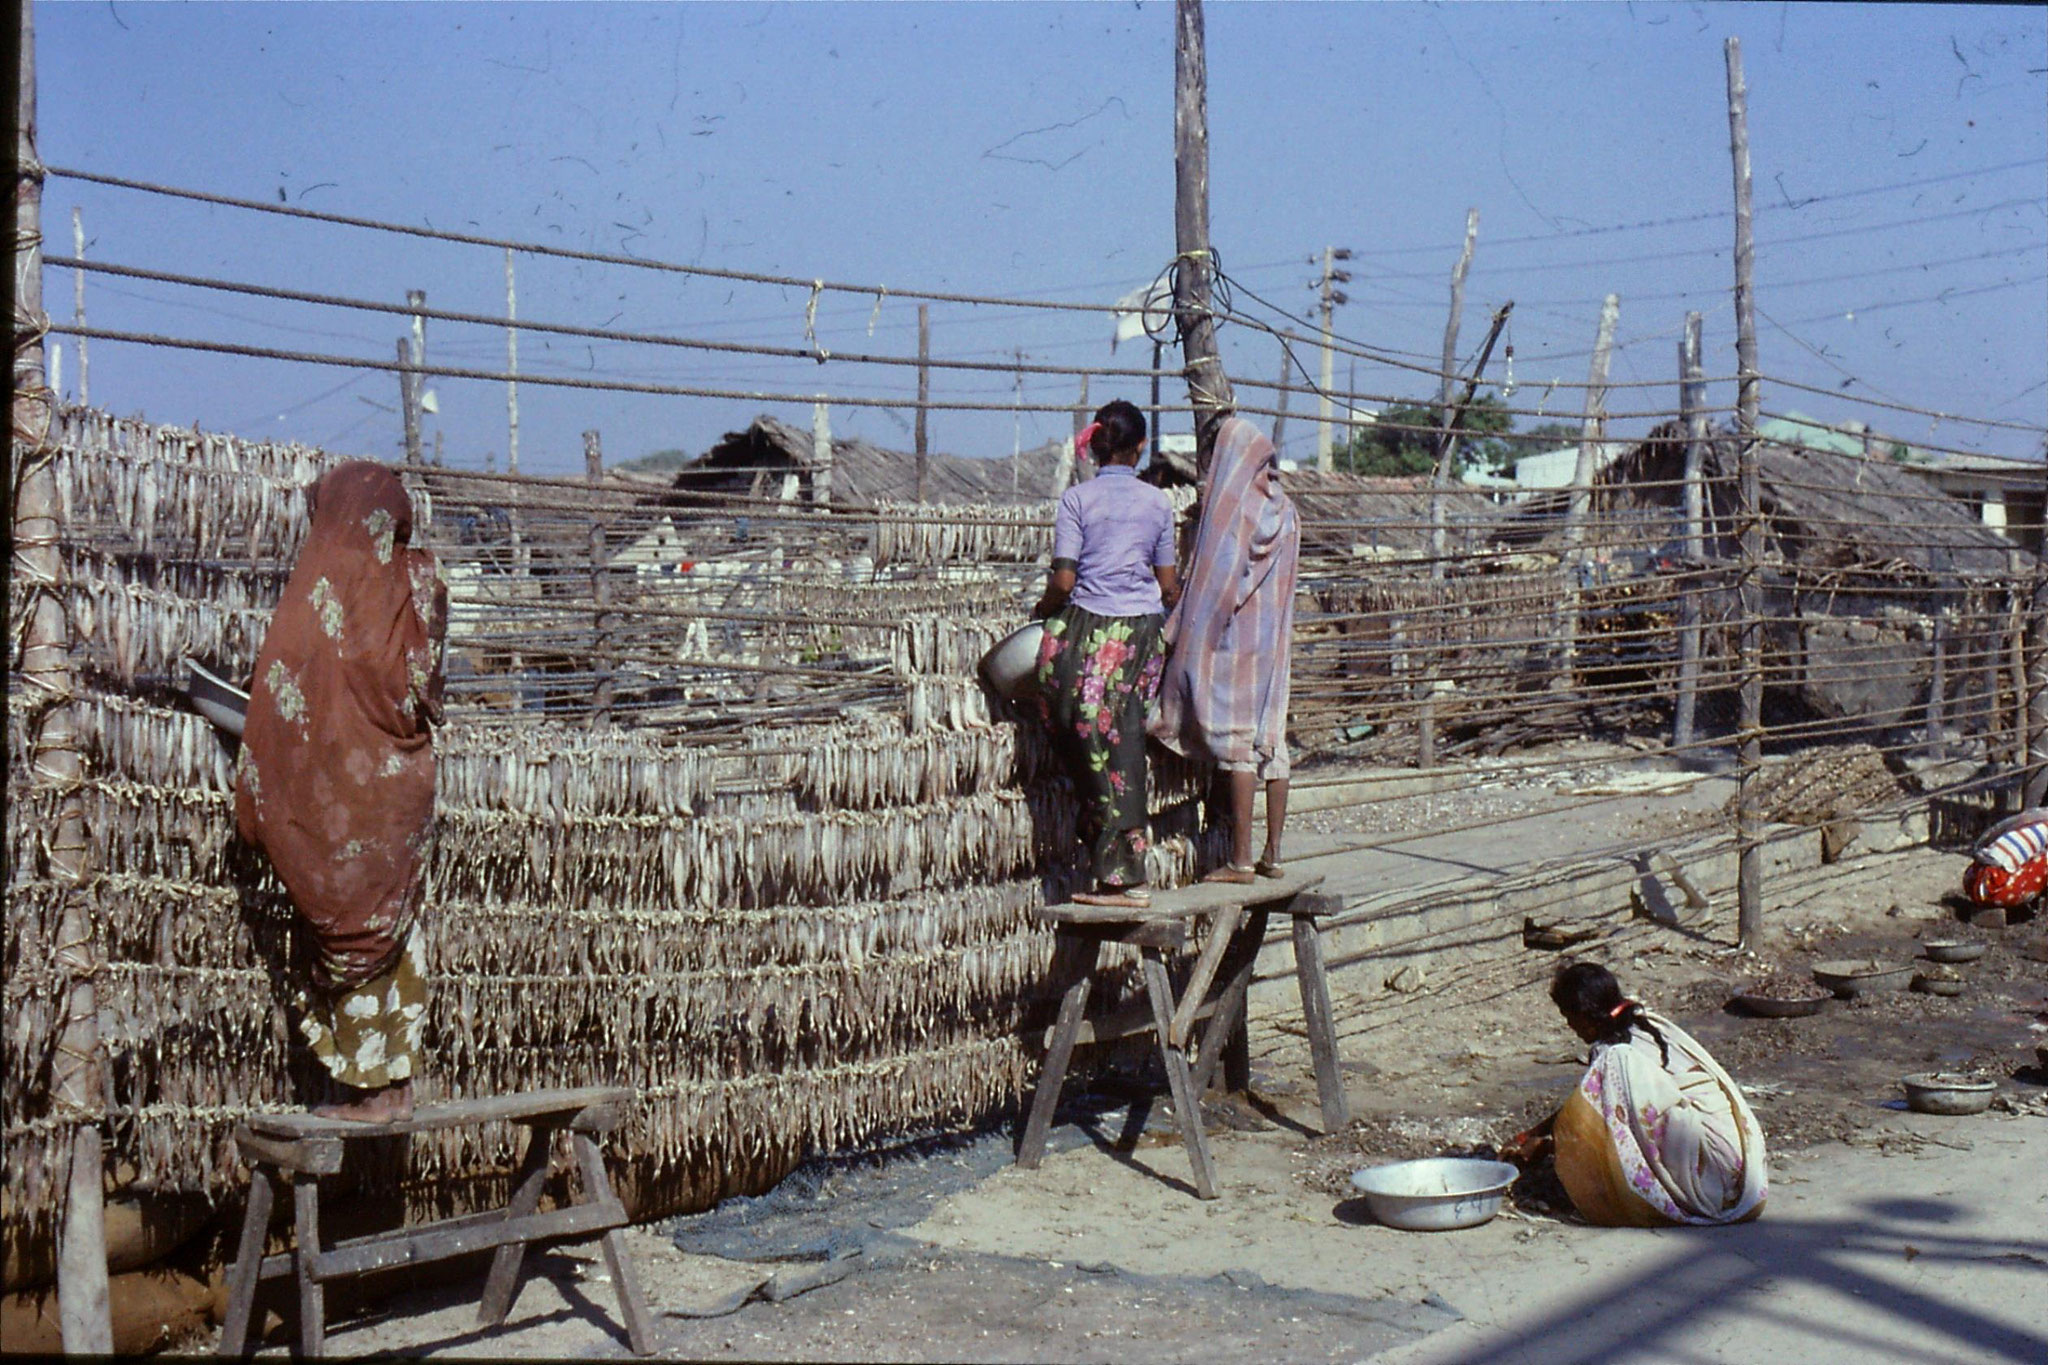 16/12/1989: 6: Diu Goghla fisherwomen